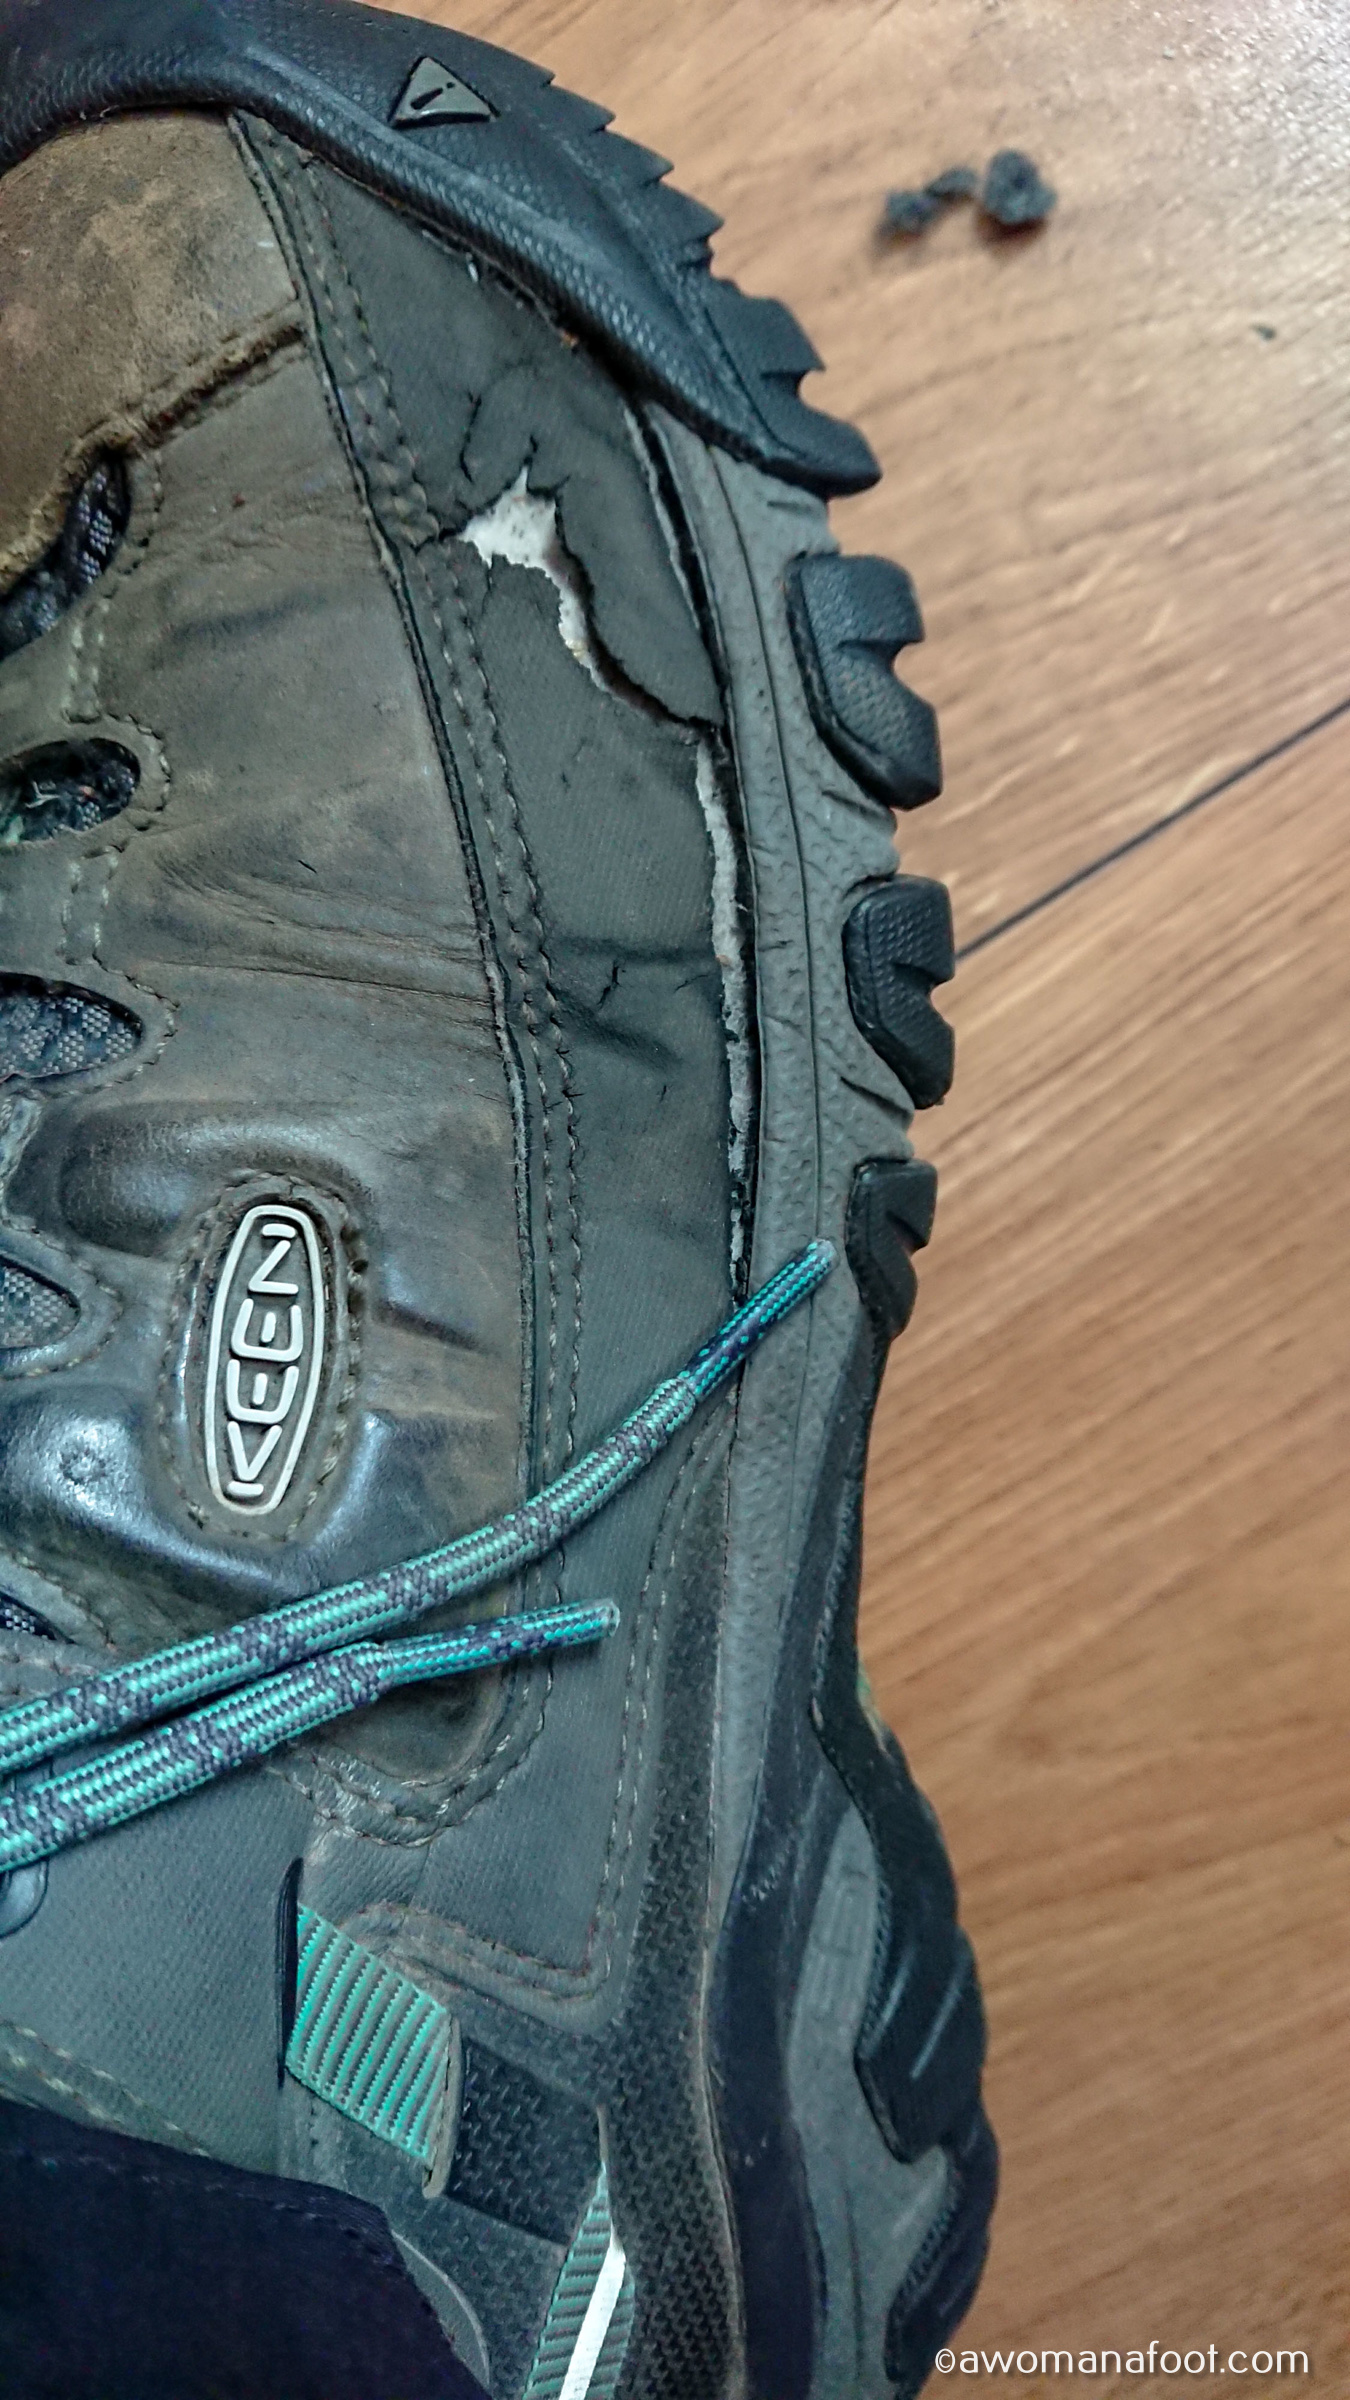 Keen Targhee III hiking boots women review3.jpg